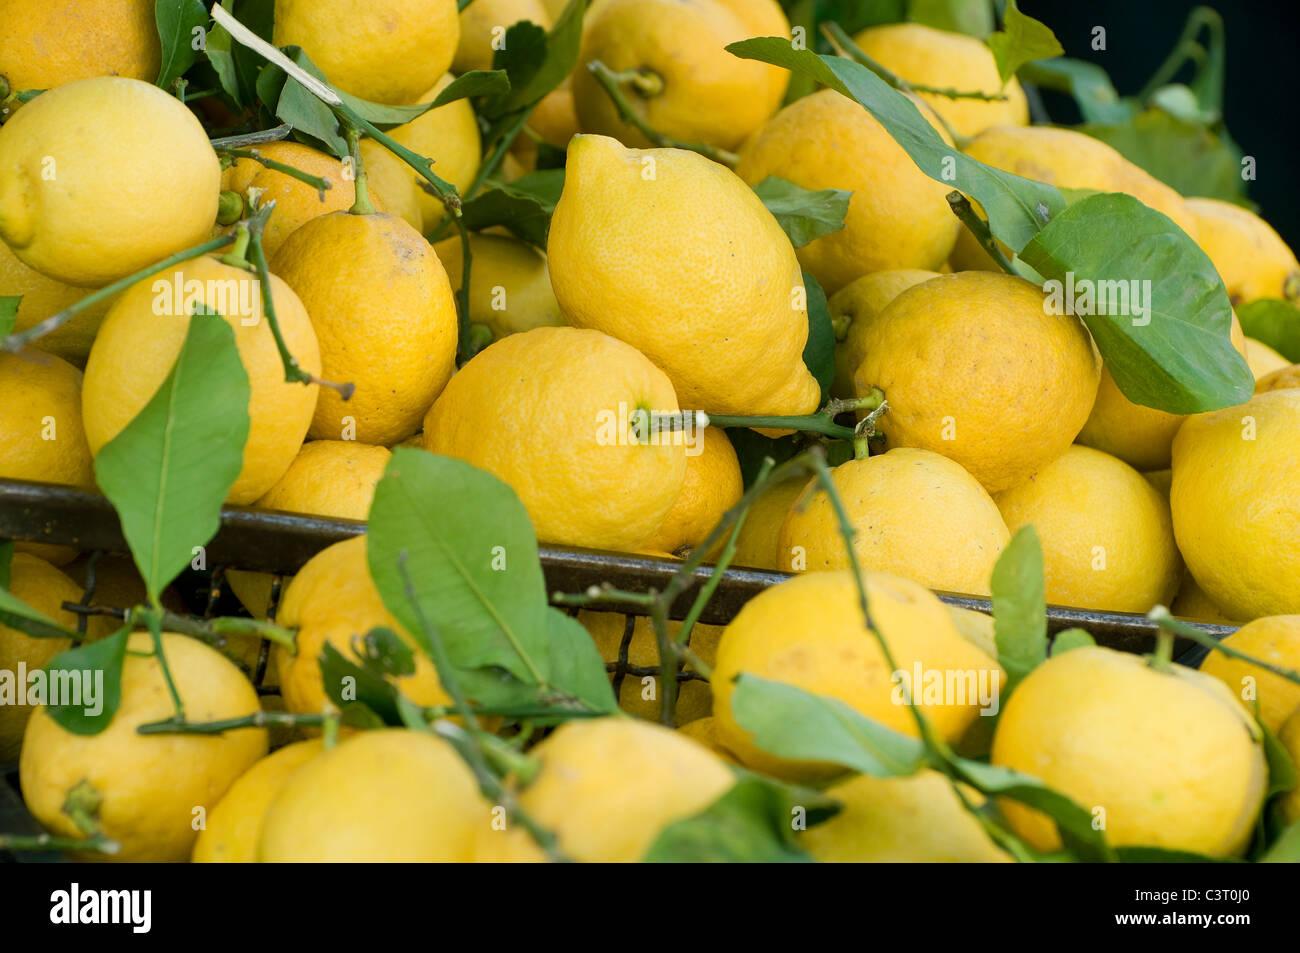 freshly picked organic lemons on market food stall, turin, italy Stock Photo